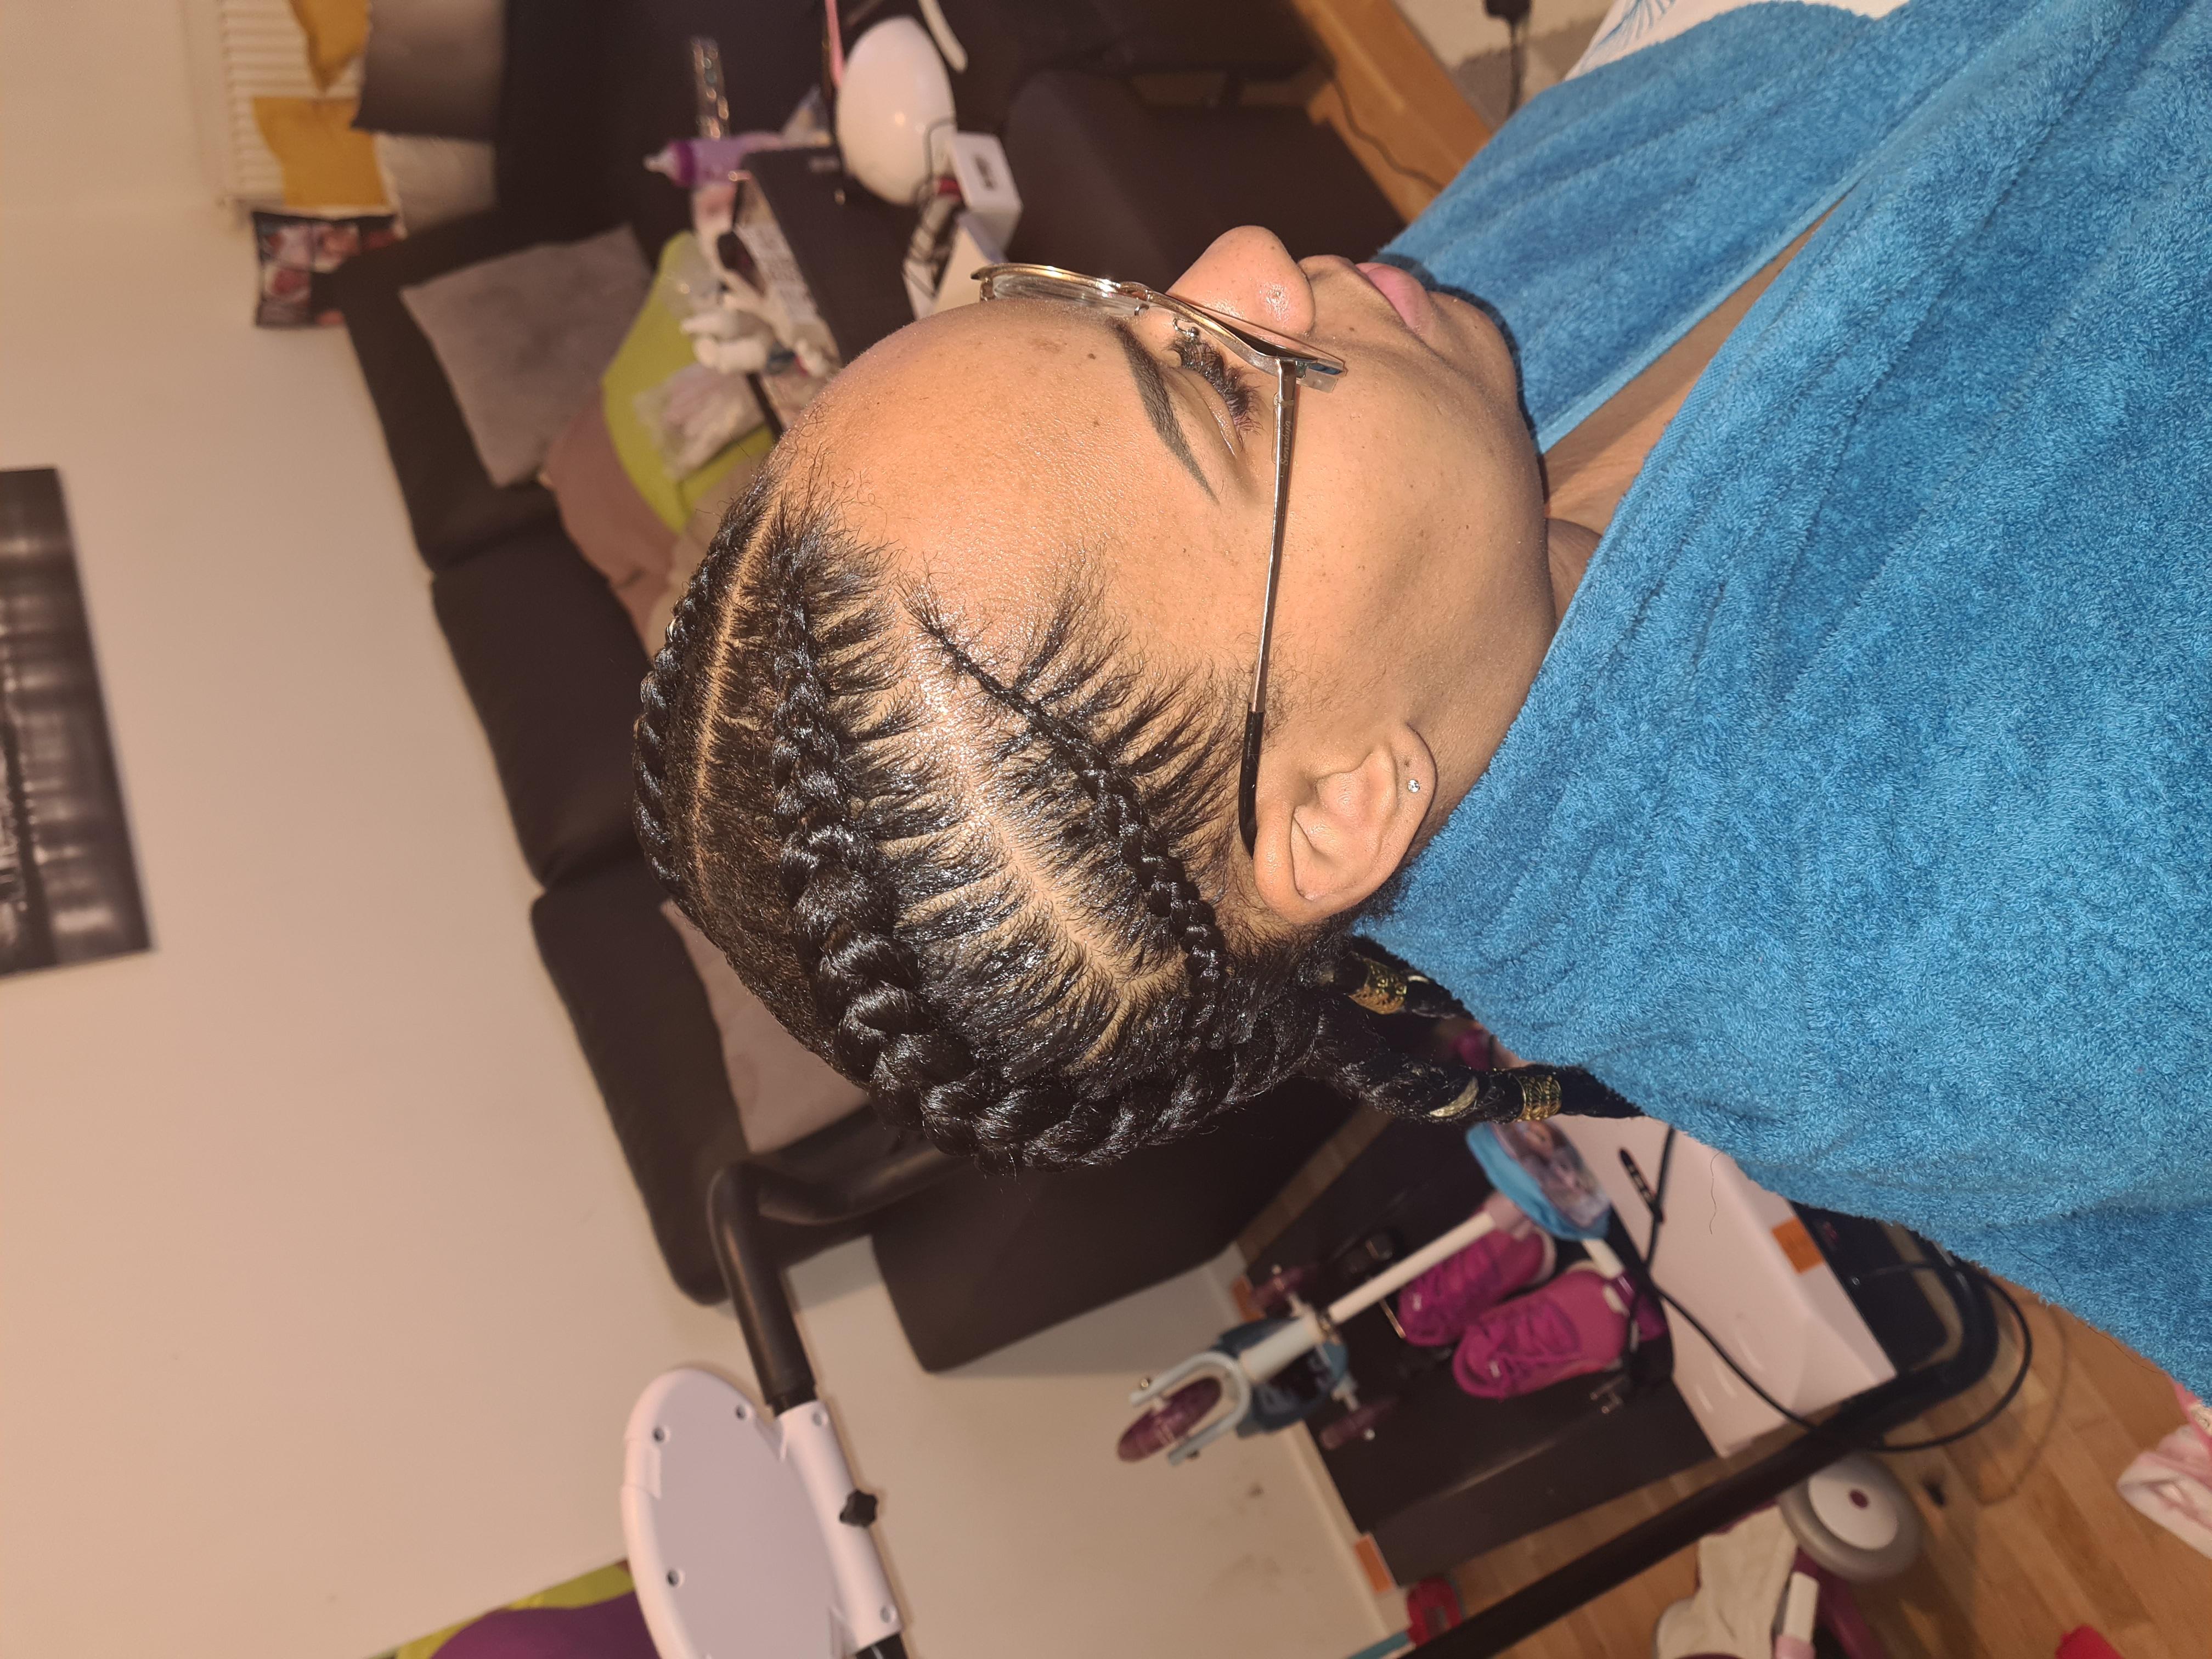 salon de coiffure afro tresse tresses box braids crochet braids vanilles tissages paris 75 77 78 91 92 93 94 95 SJQZUSCH